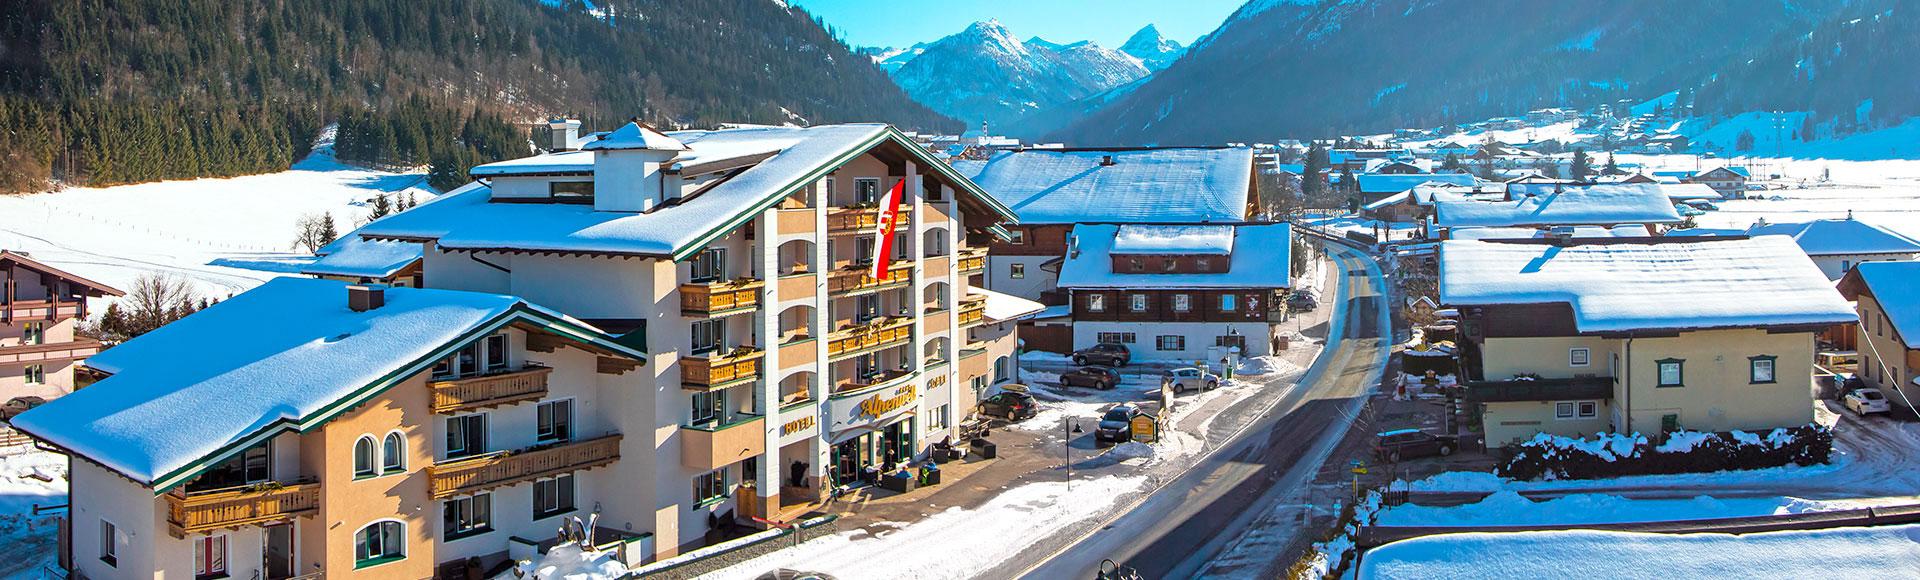 3 Sterne Superior Hotel in Flachau, Ski amadé